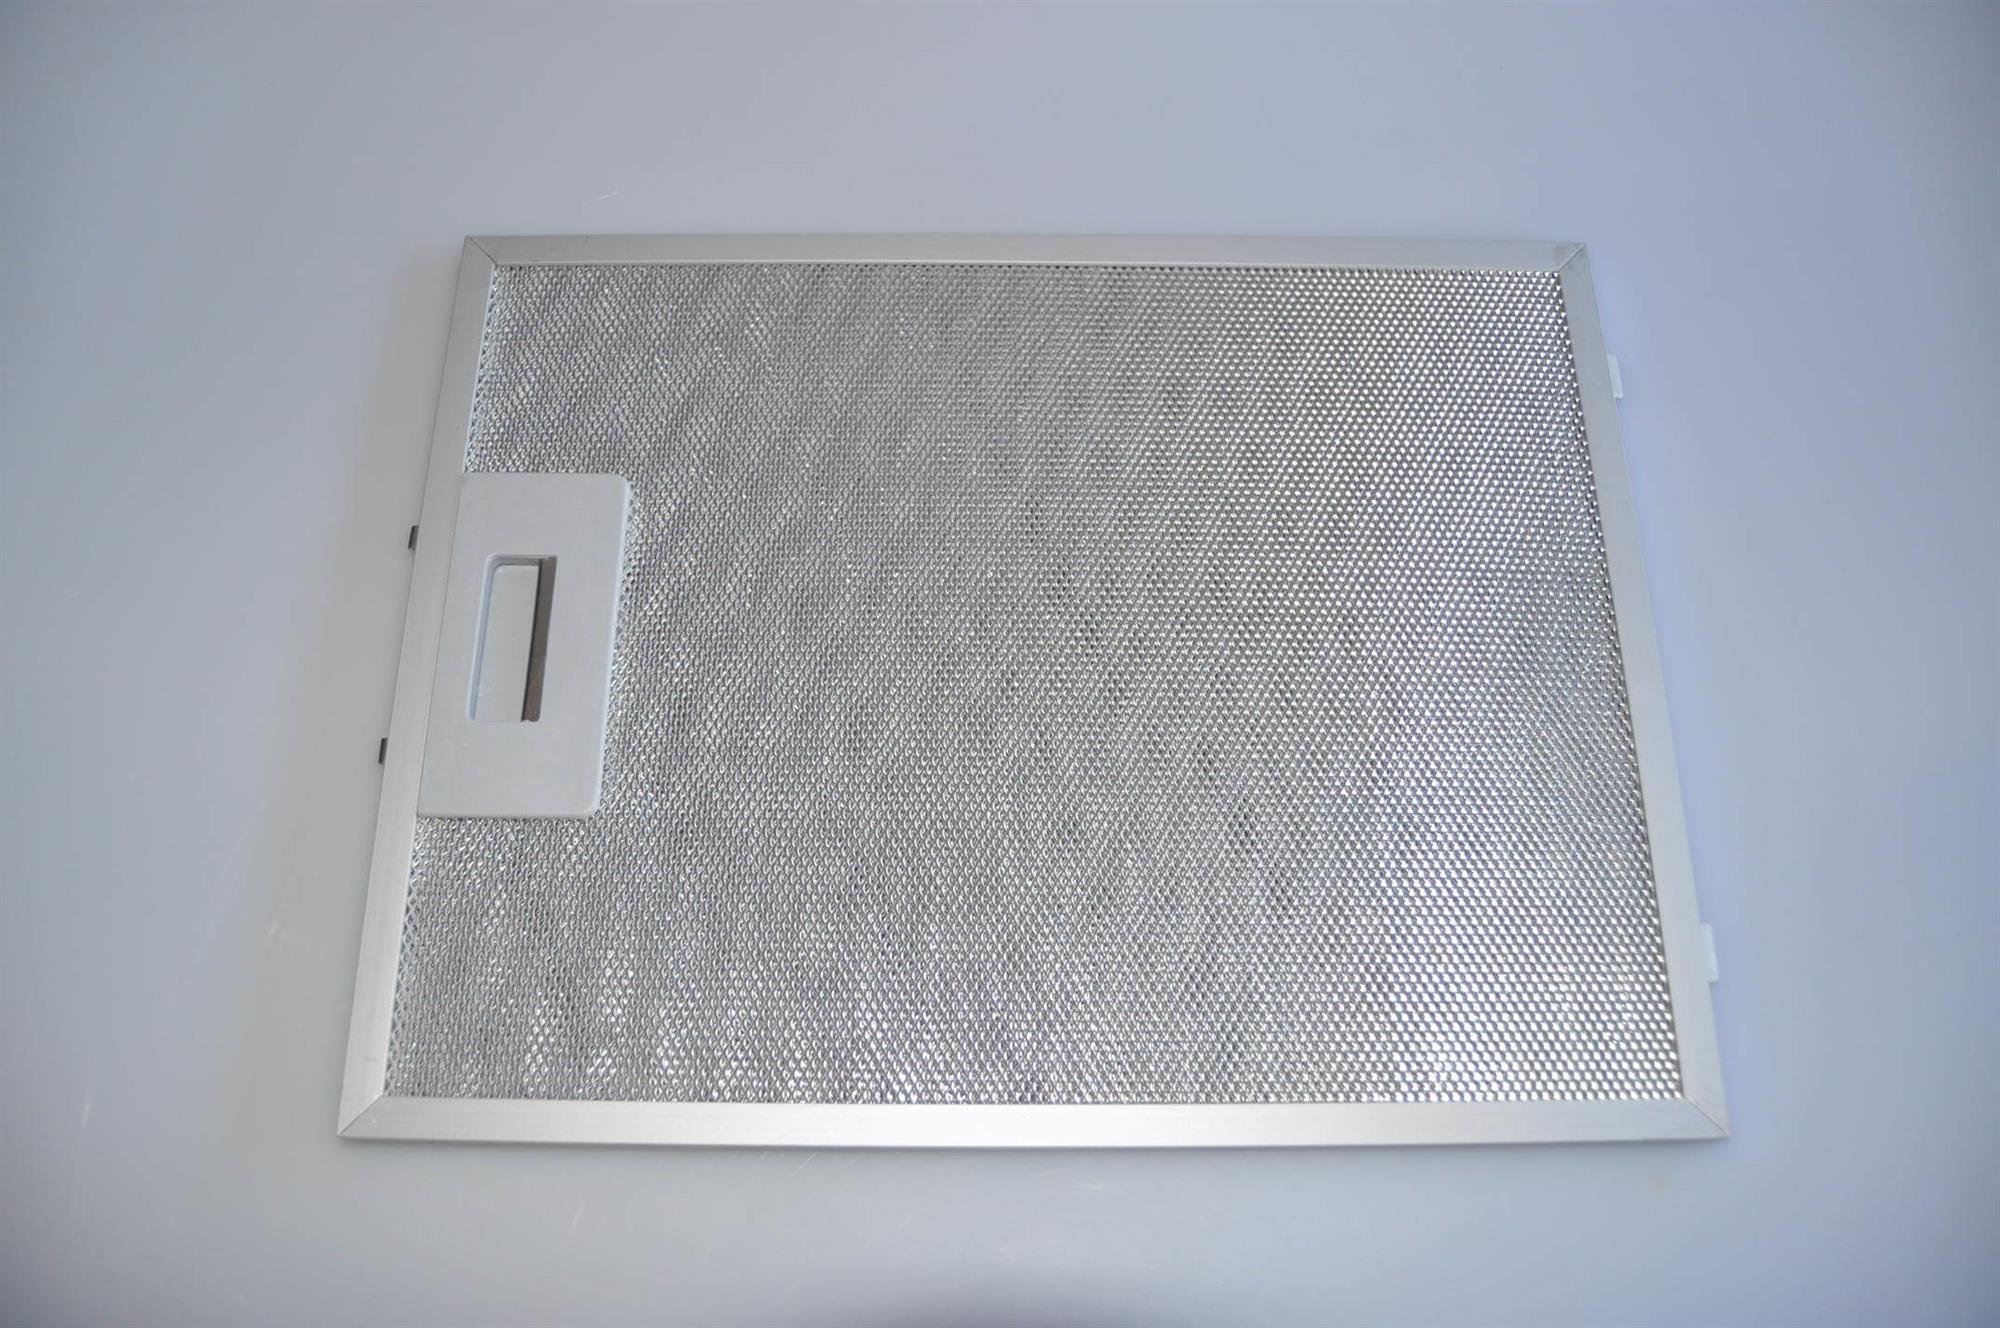 Metalfilter asko emhaette 320x245x7 mm fedtfilter for Hanseatic dunstabzugshaube